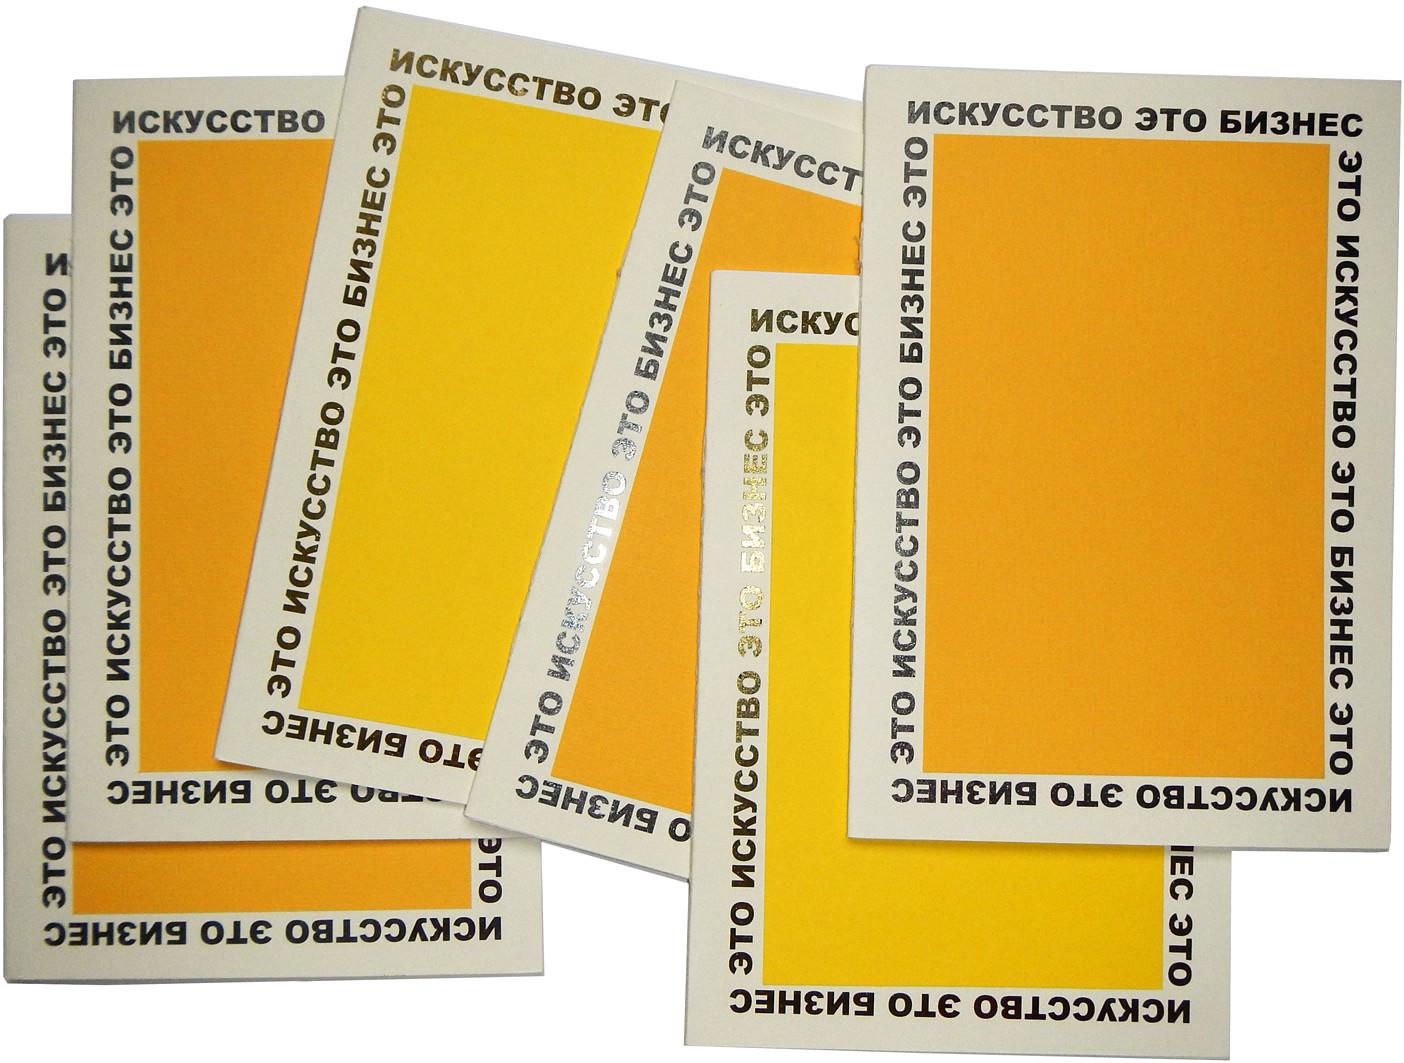 2015 ИББИ, 21х14,8 см, 6 экз, цифр.печать, штамп, 12с, 6 книг-1